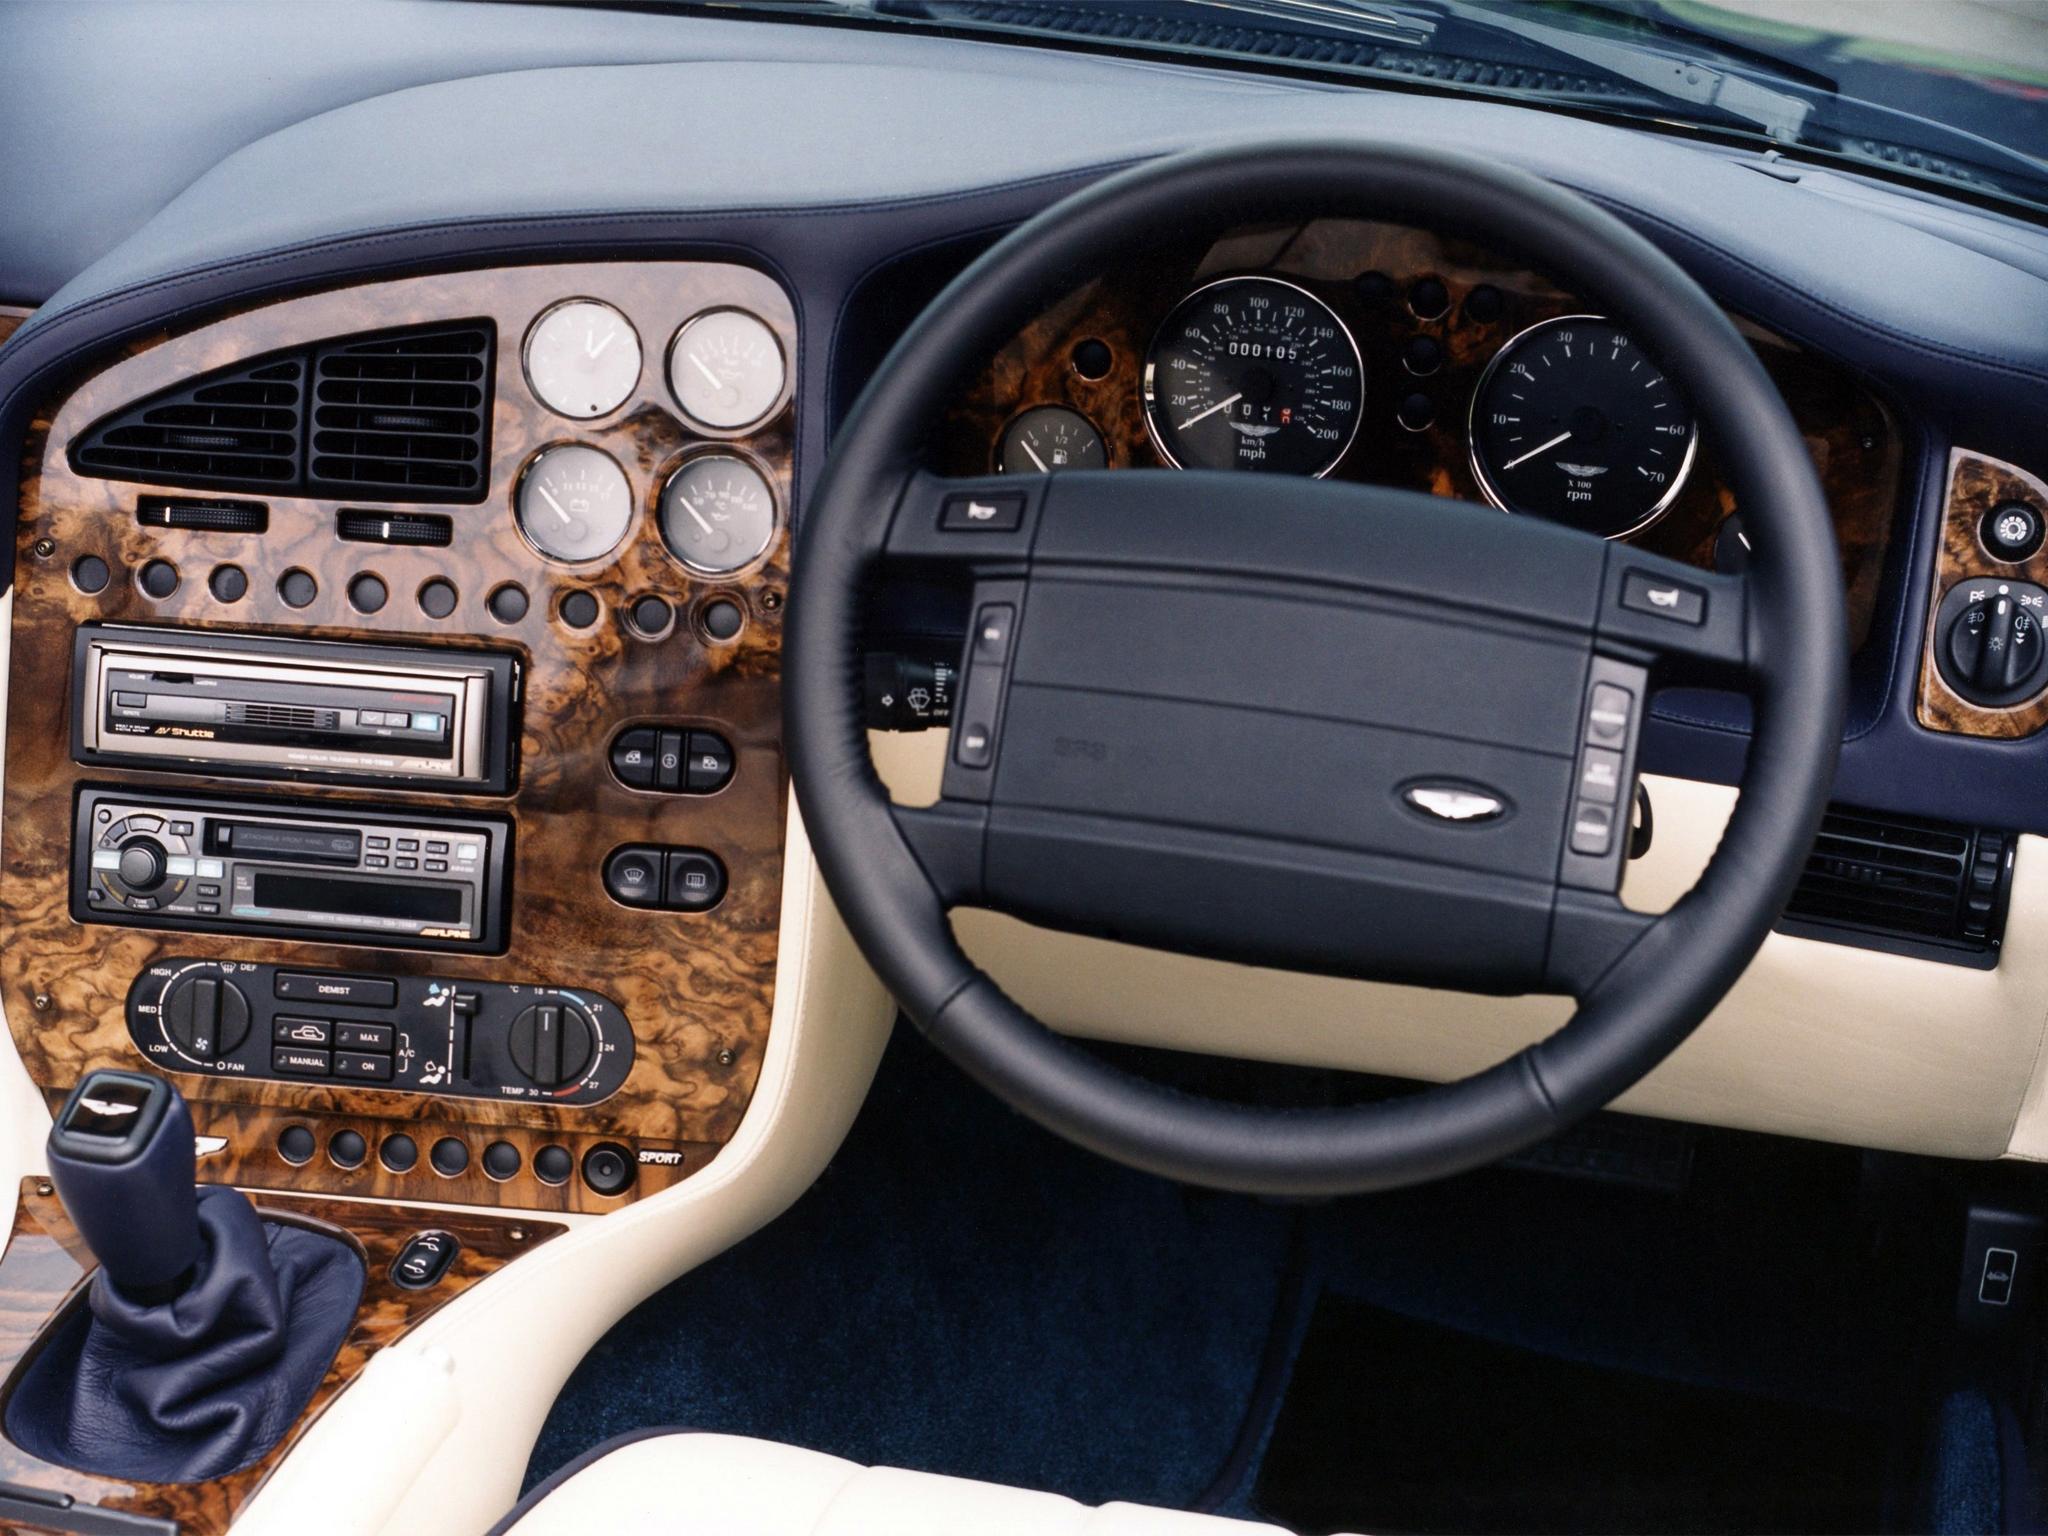 Wallpaper Aston Martin V8 Vantage 1993 Salon Interior Steering Wheel Speedometer 2048x1536 Wallup 1084621 Hd Wallpapers Wallhere